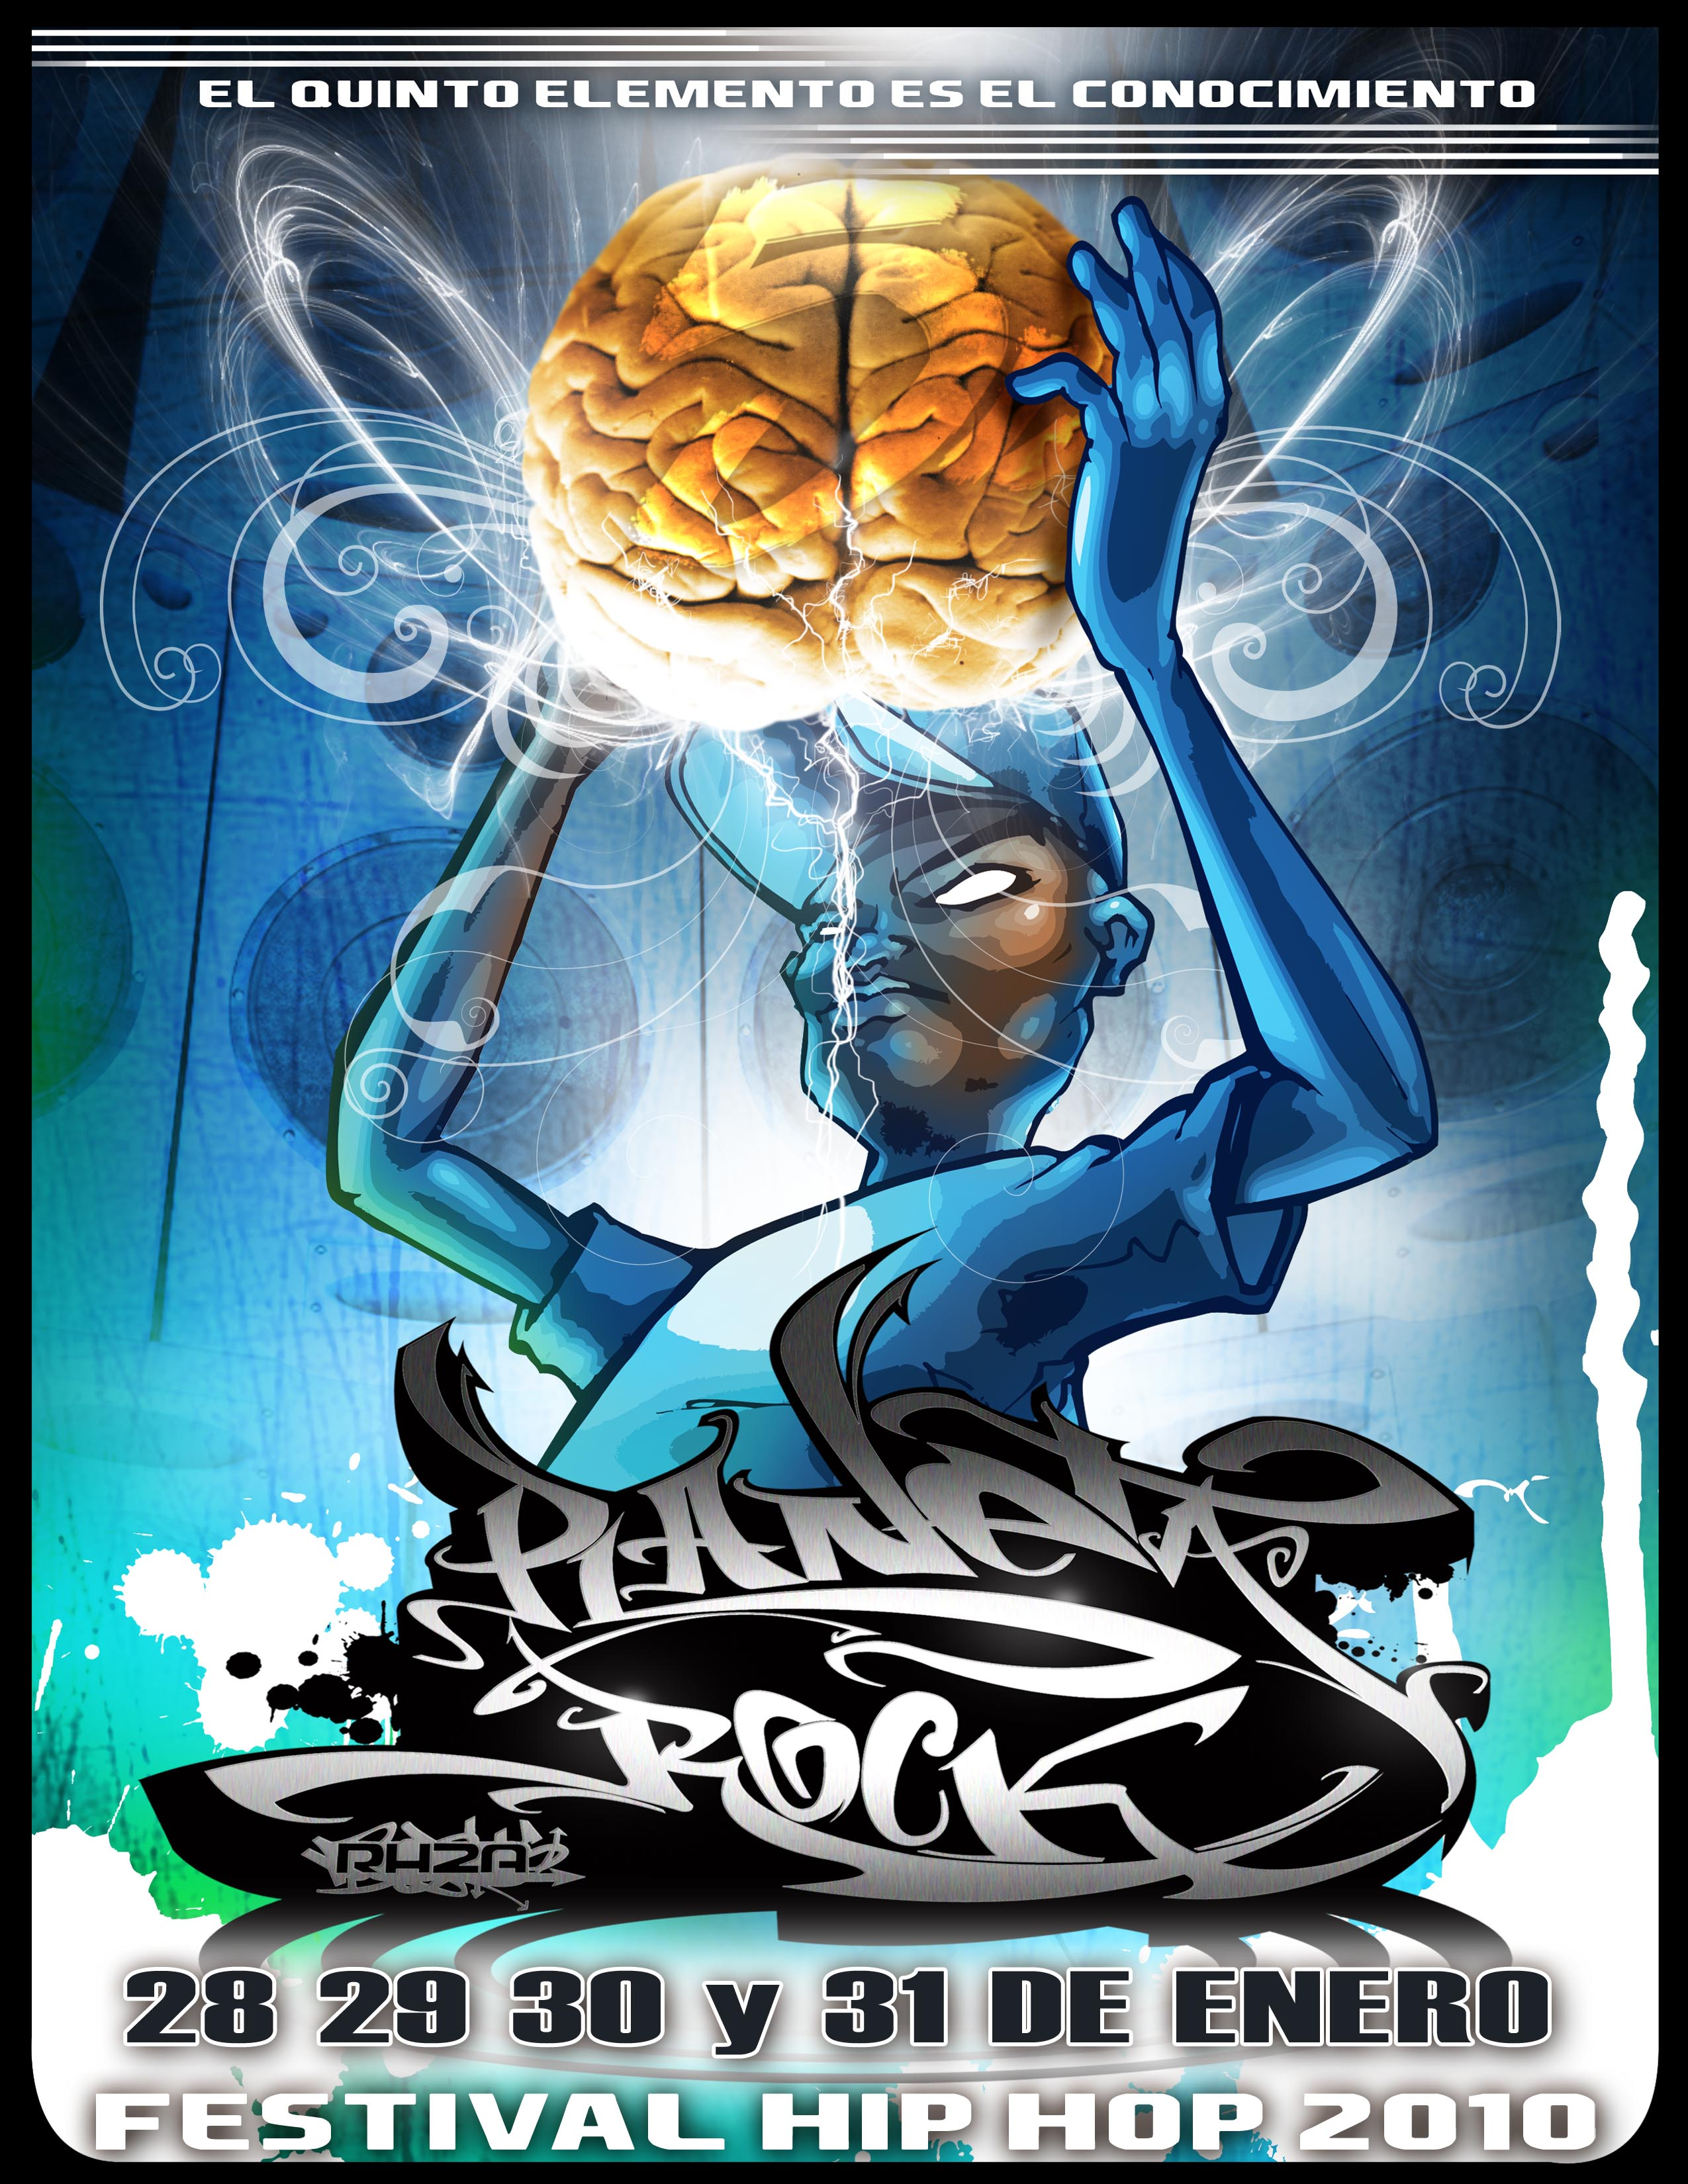 Promocional Planeta Rock 2010